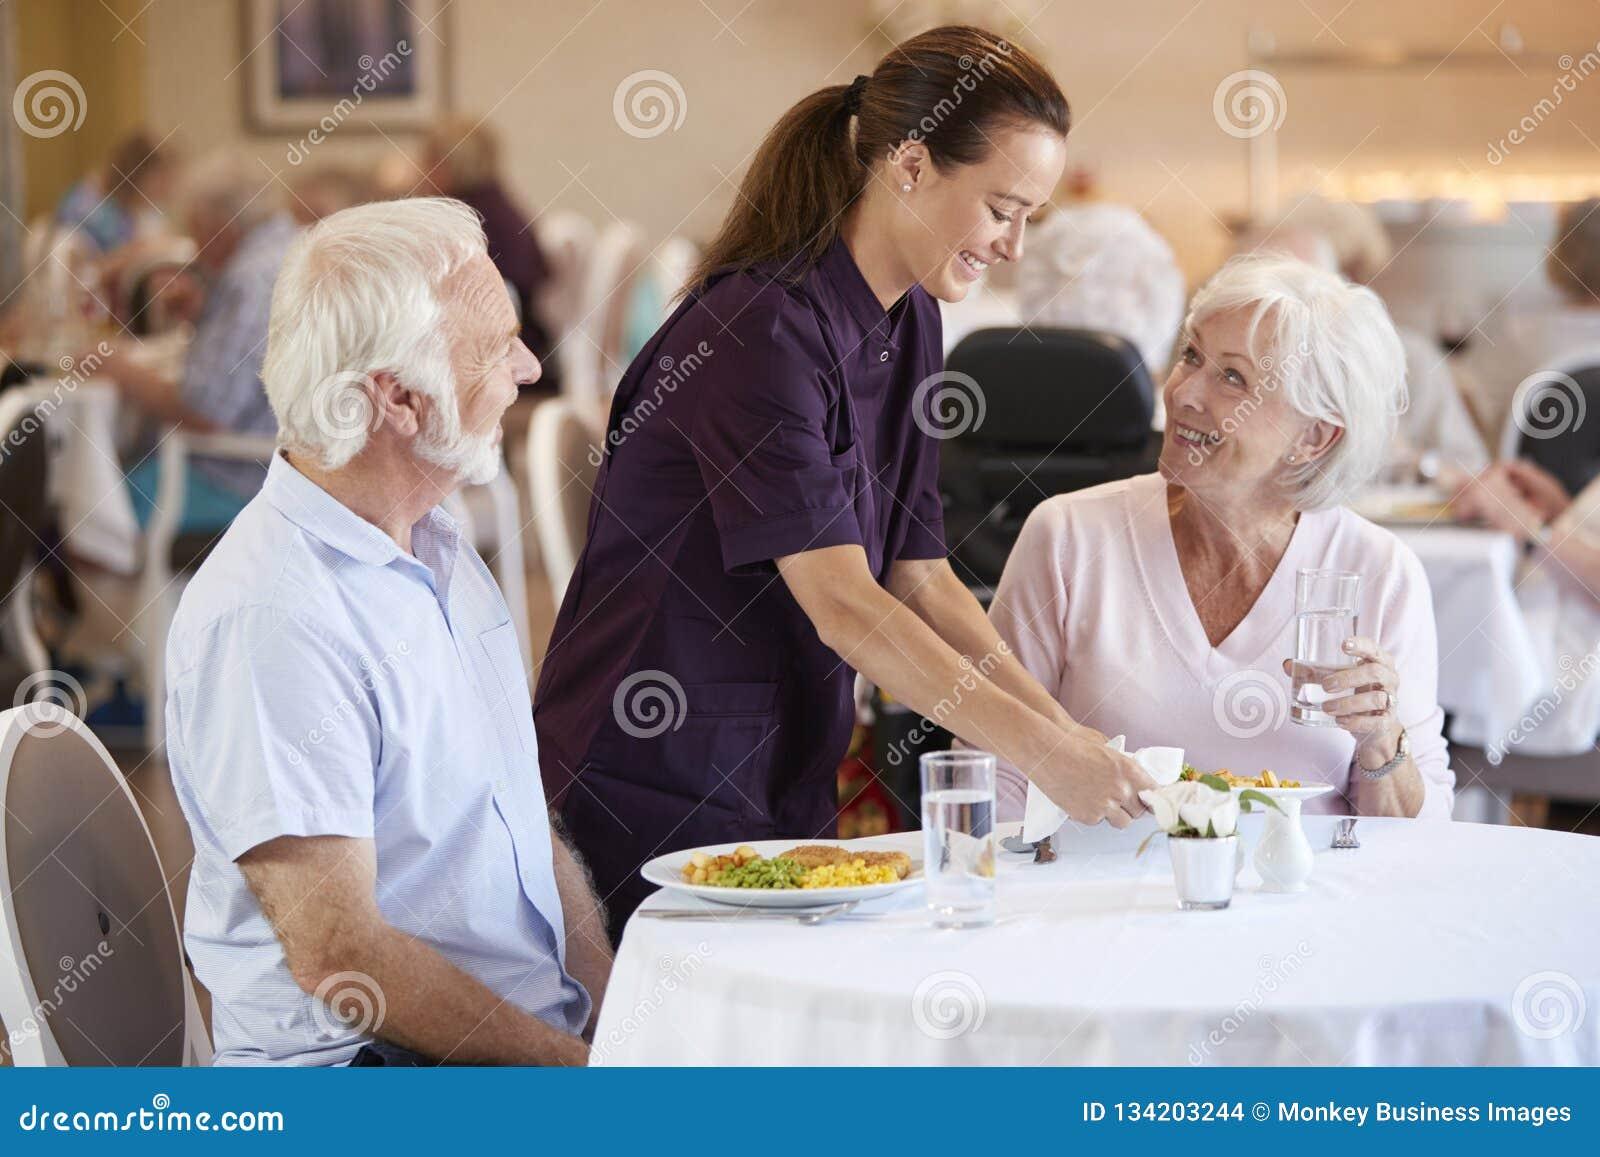 Hoger Paar die met Maaltijd door Werker uit de hulpverlening in Eetkamer van Pensioneringshuis worden gediend